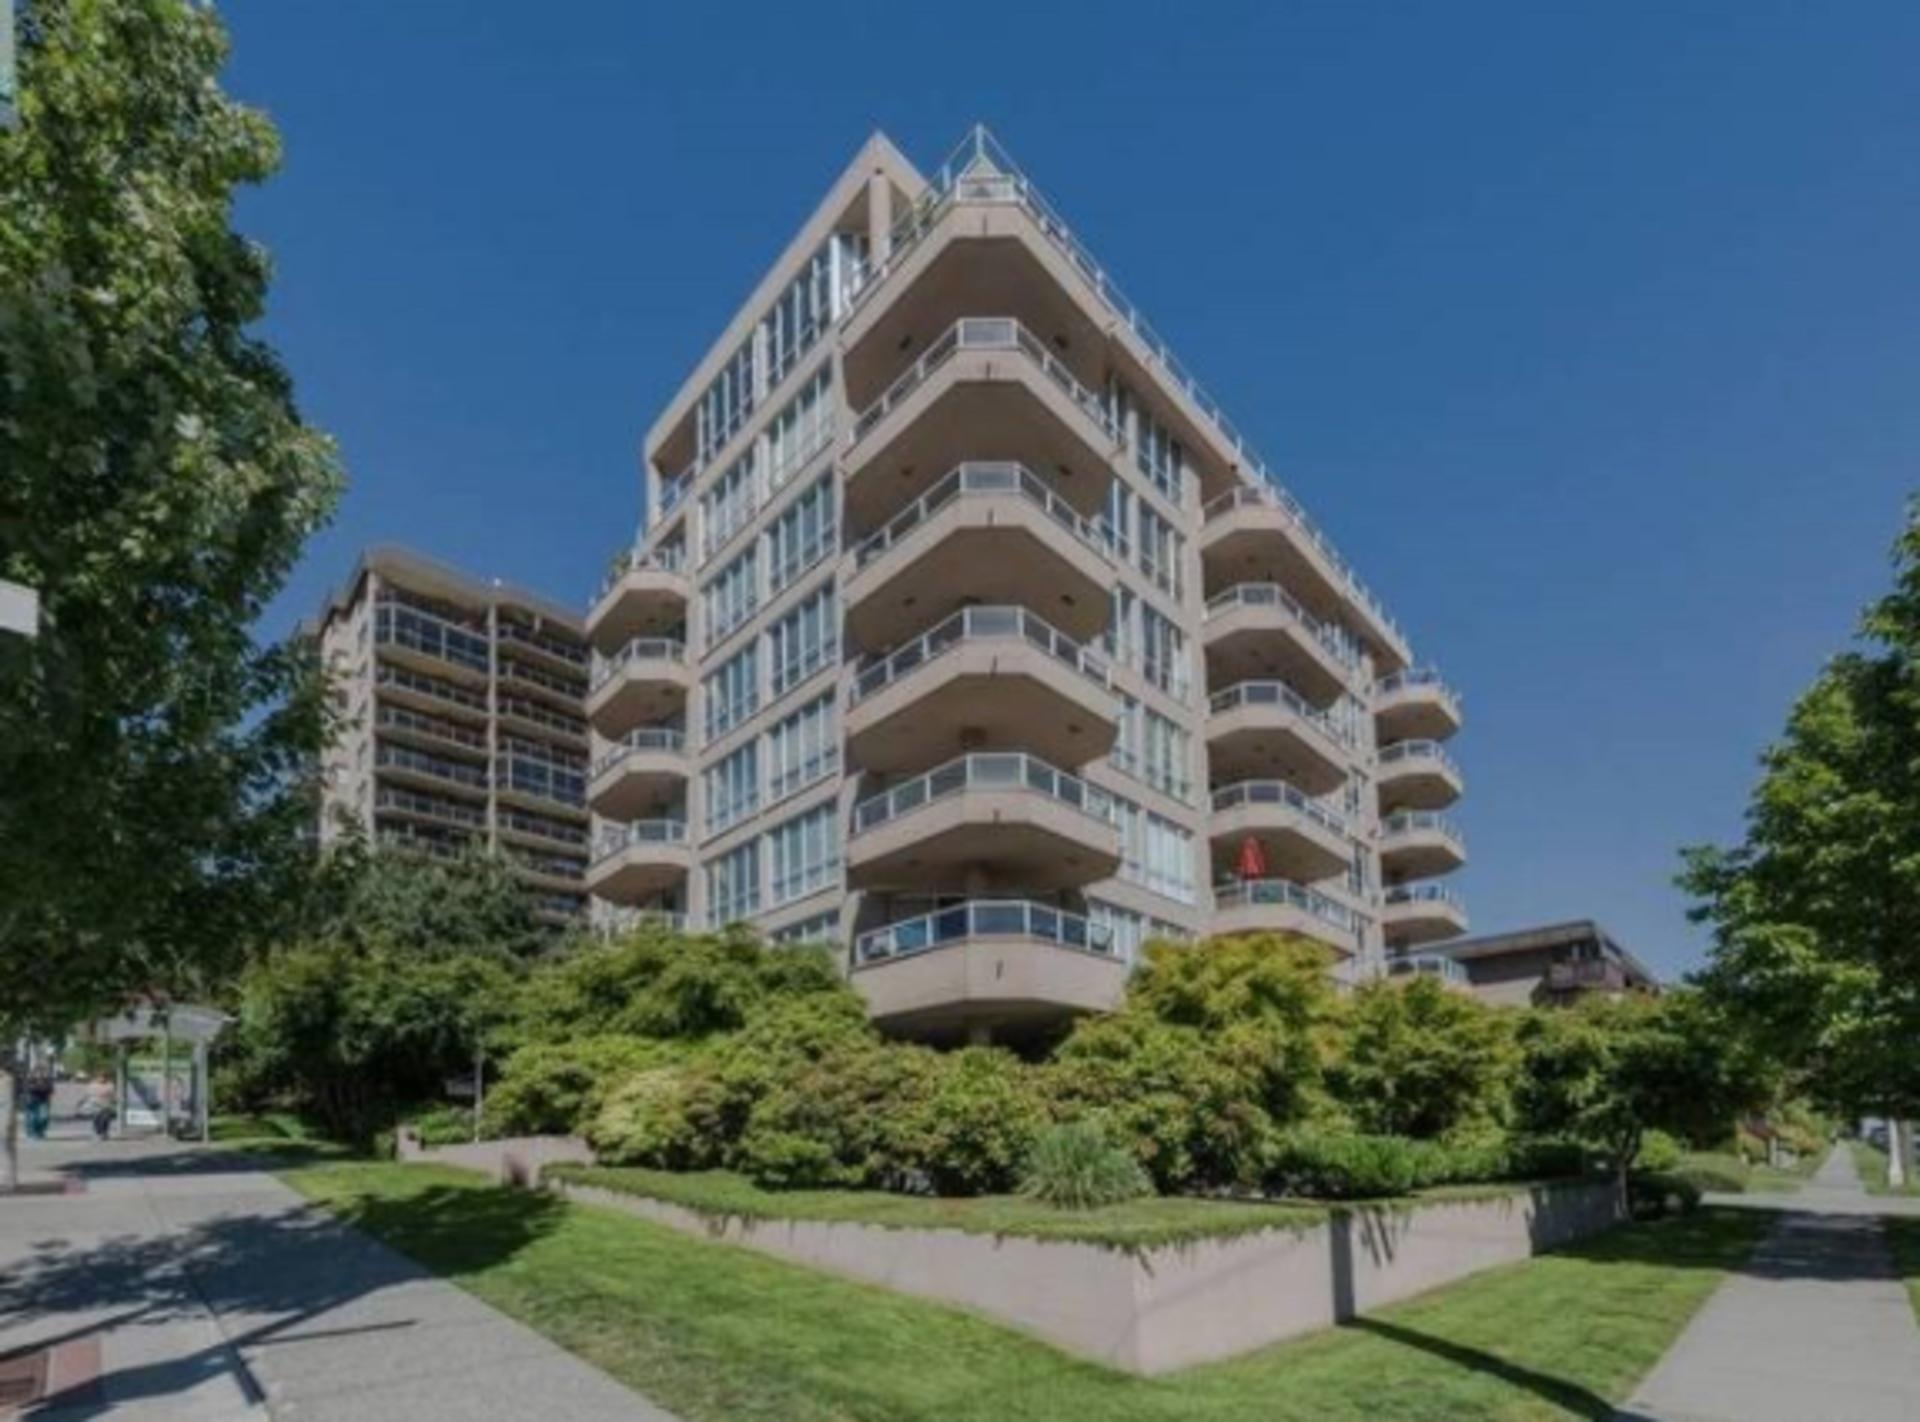 402-408-lonsdale-avenue-719000 at 402 - 408 Lonsdale Avenue, North Vancouver